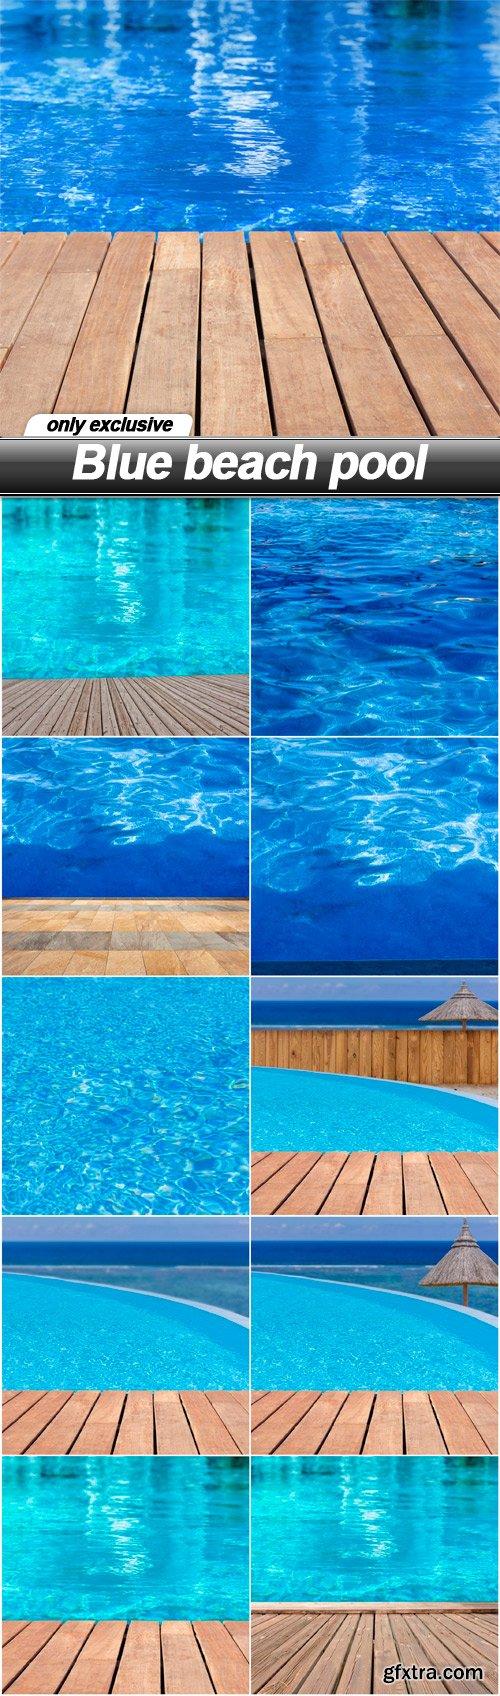 Blue beach pool - 11 EPS